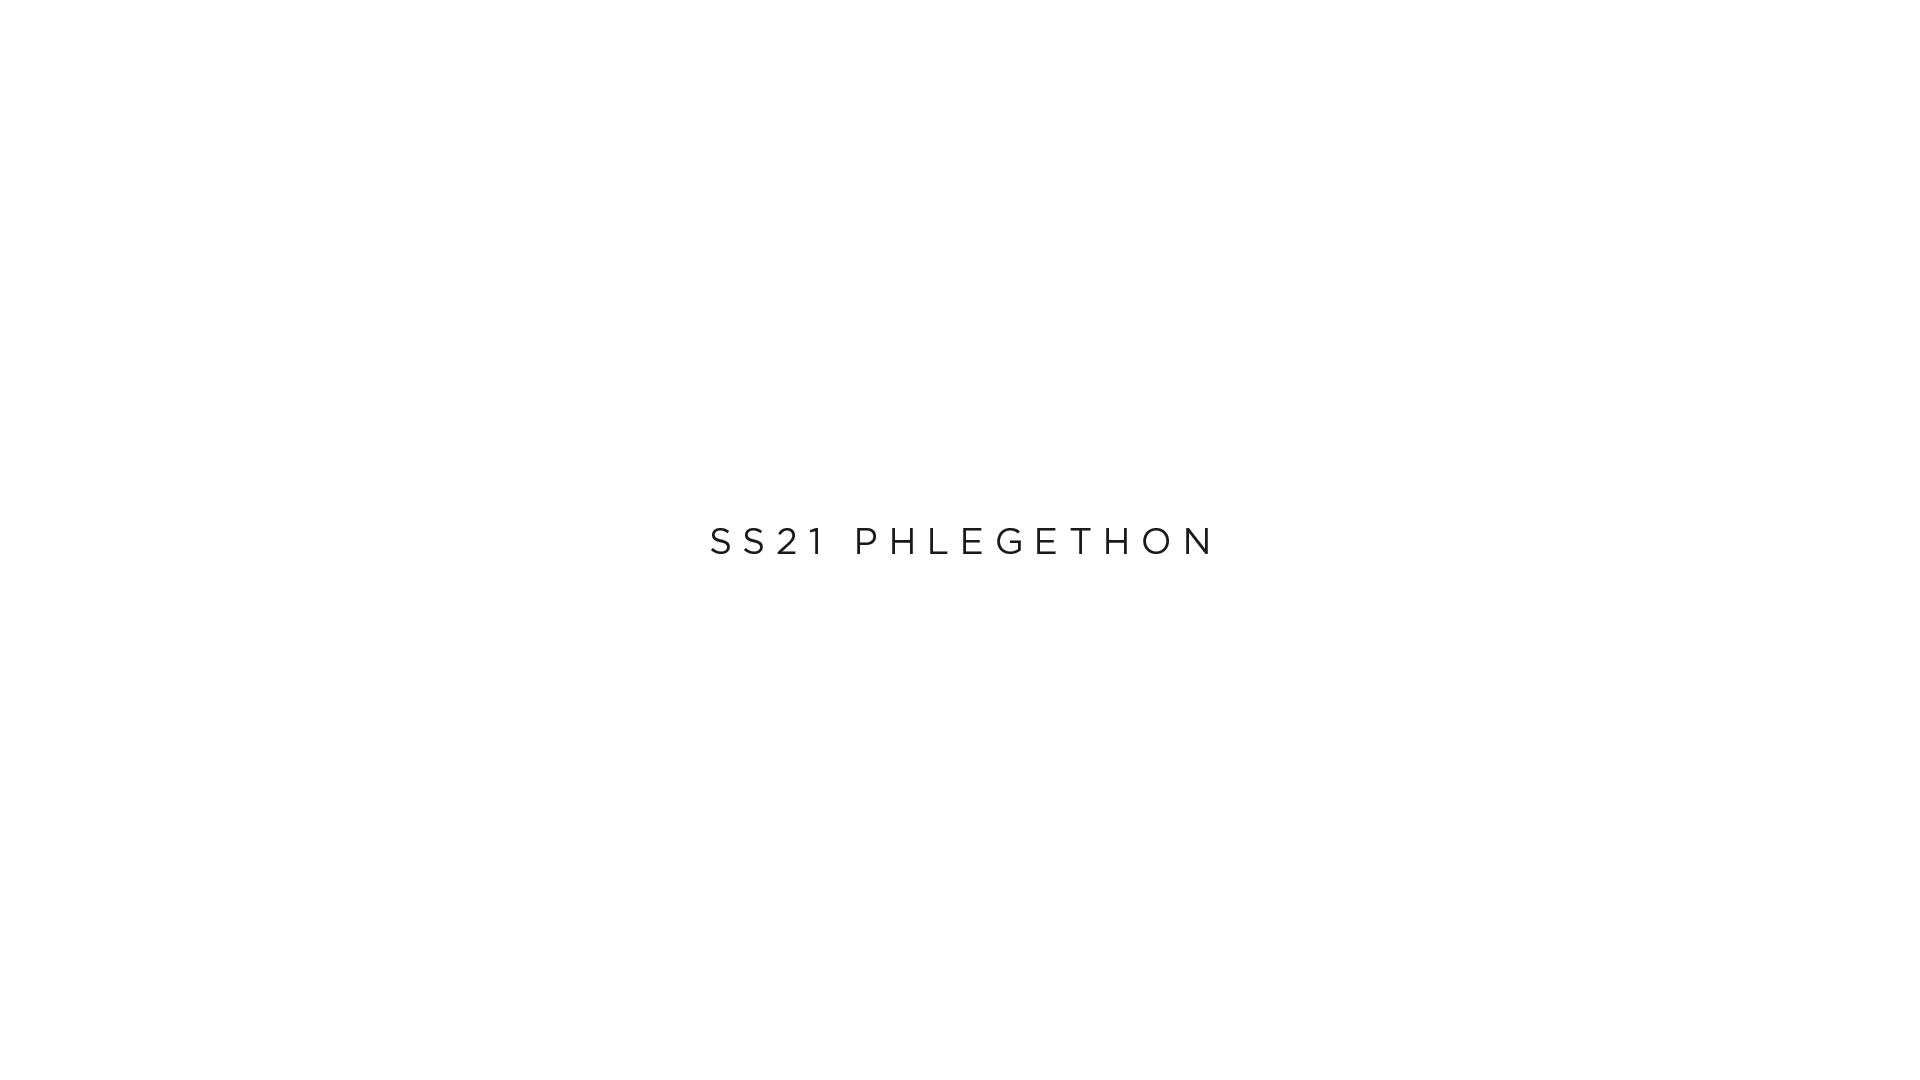 Ss21 phlegethon